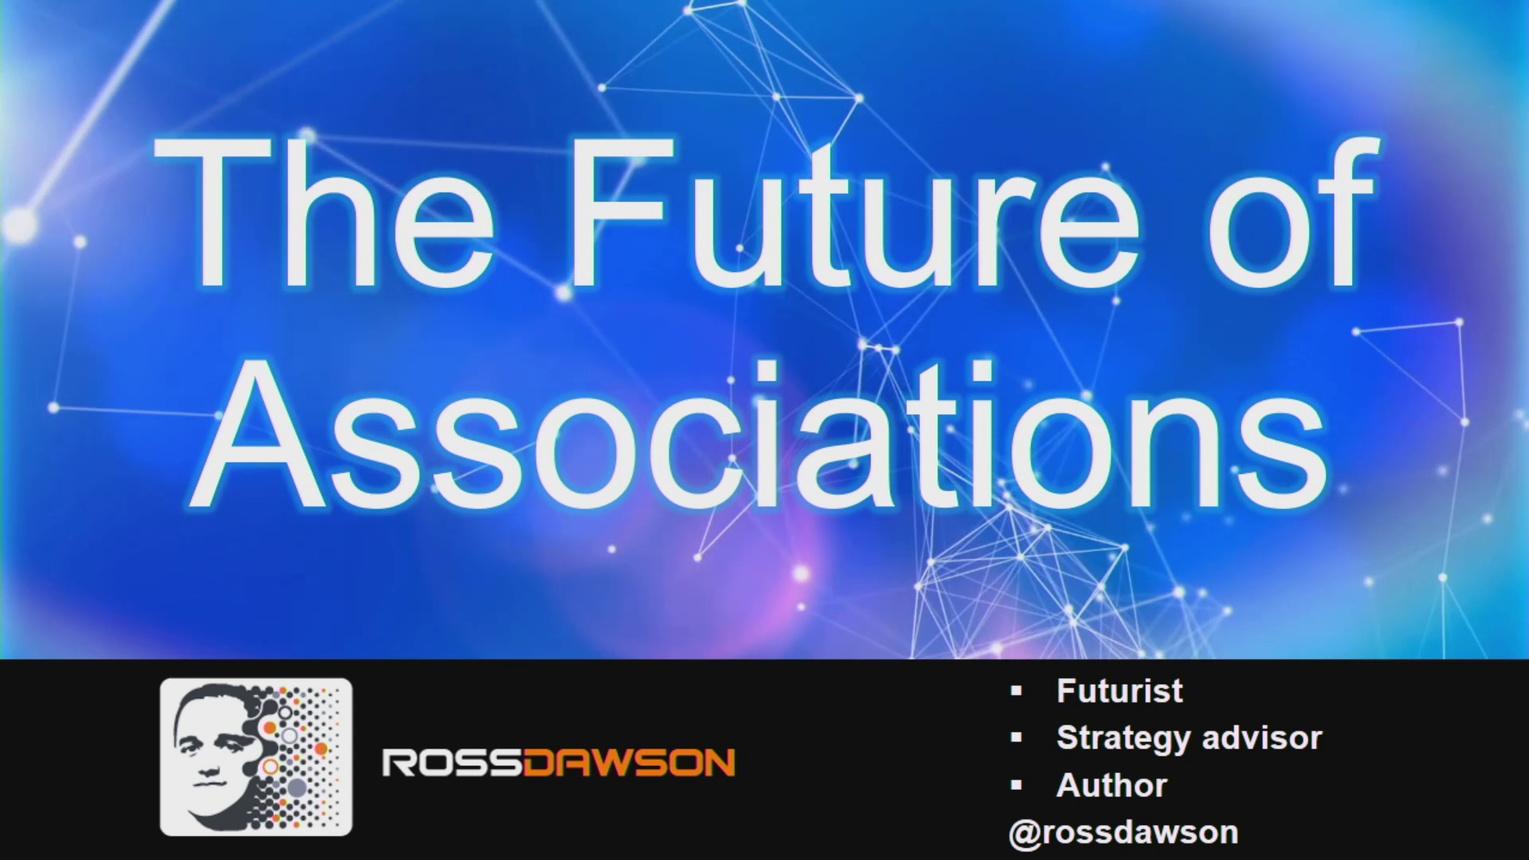 The Future of Associations - Ross Dawson Presentation from 2018 IEEE BoD Strategic Retreat